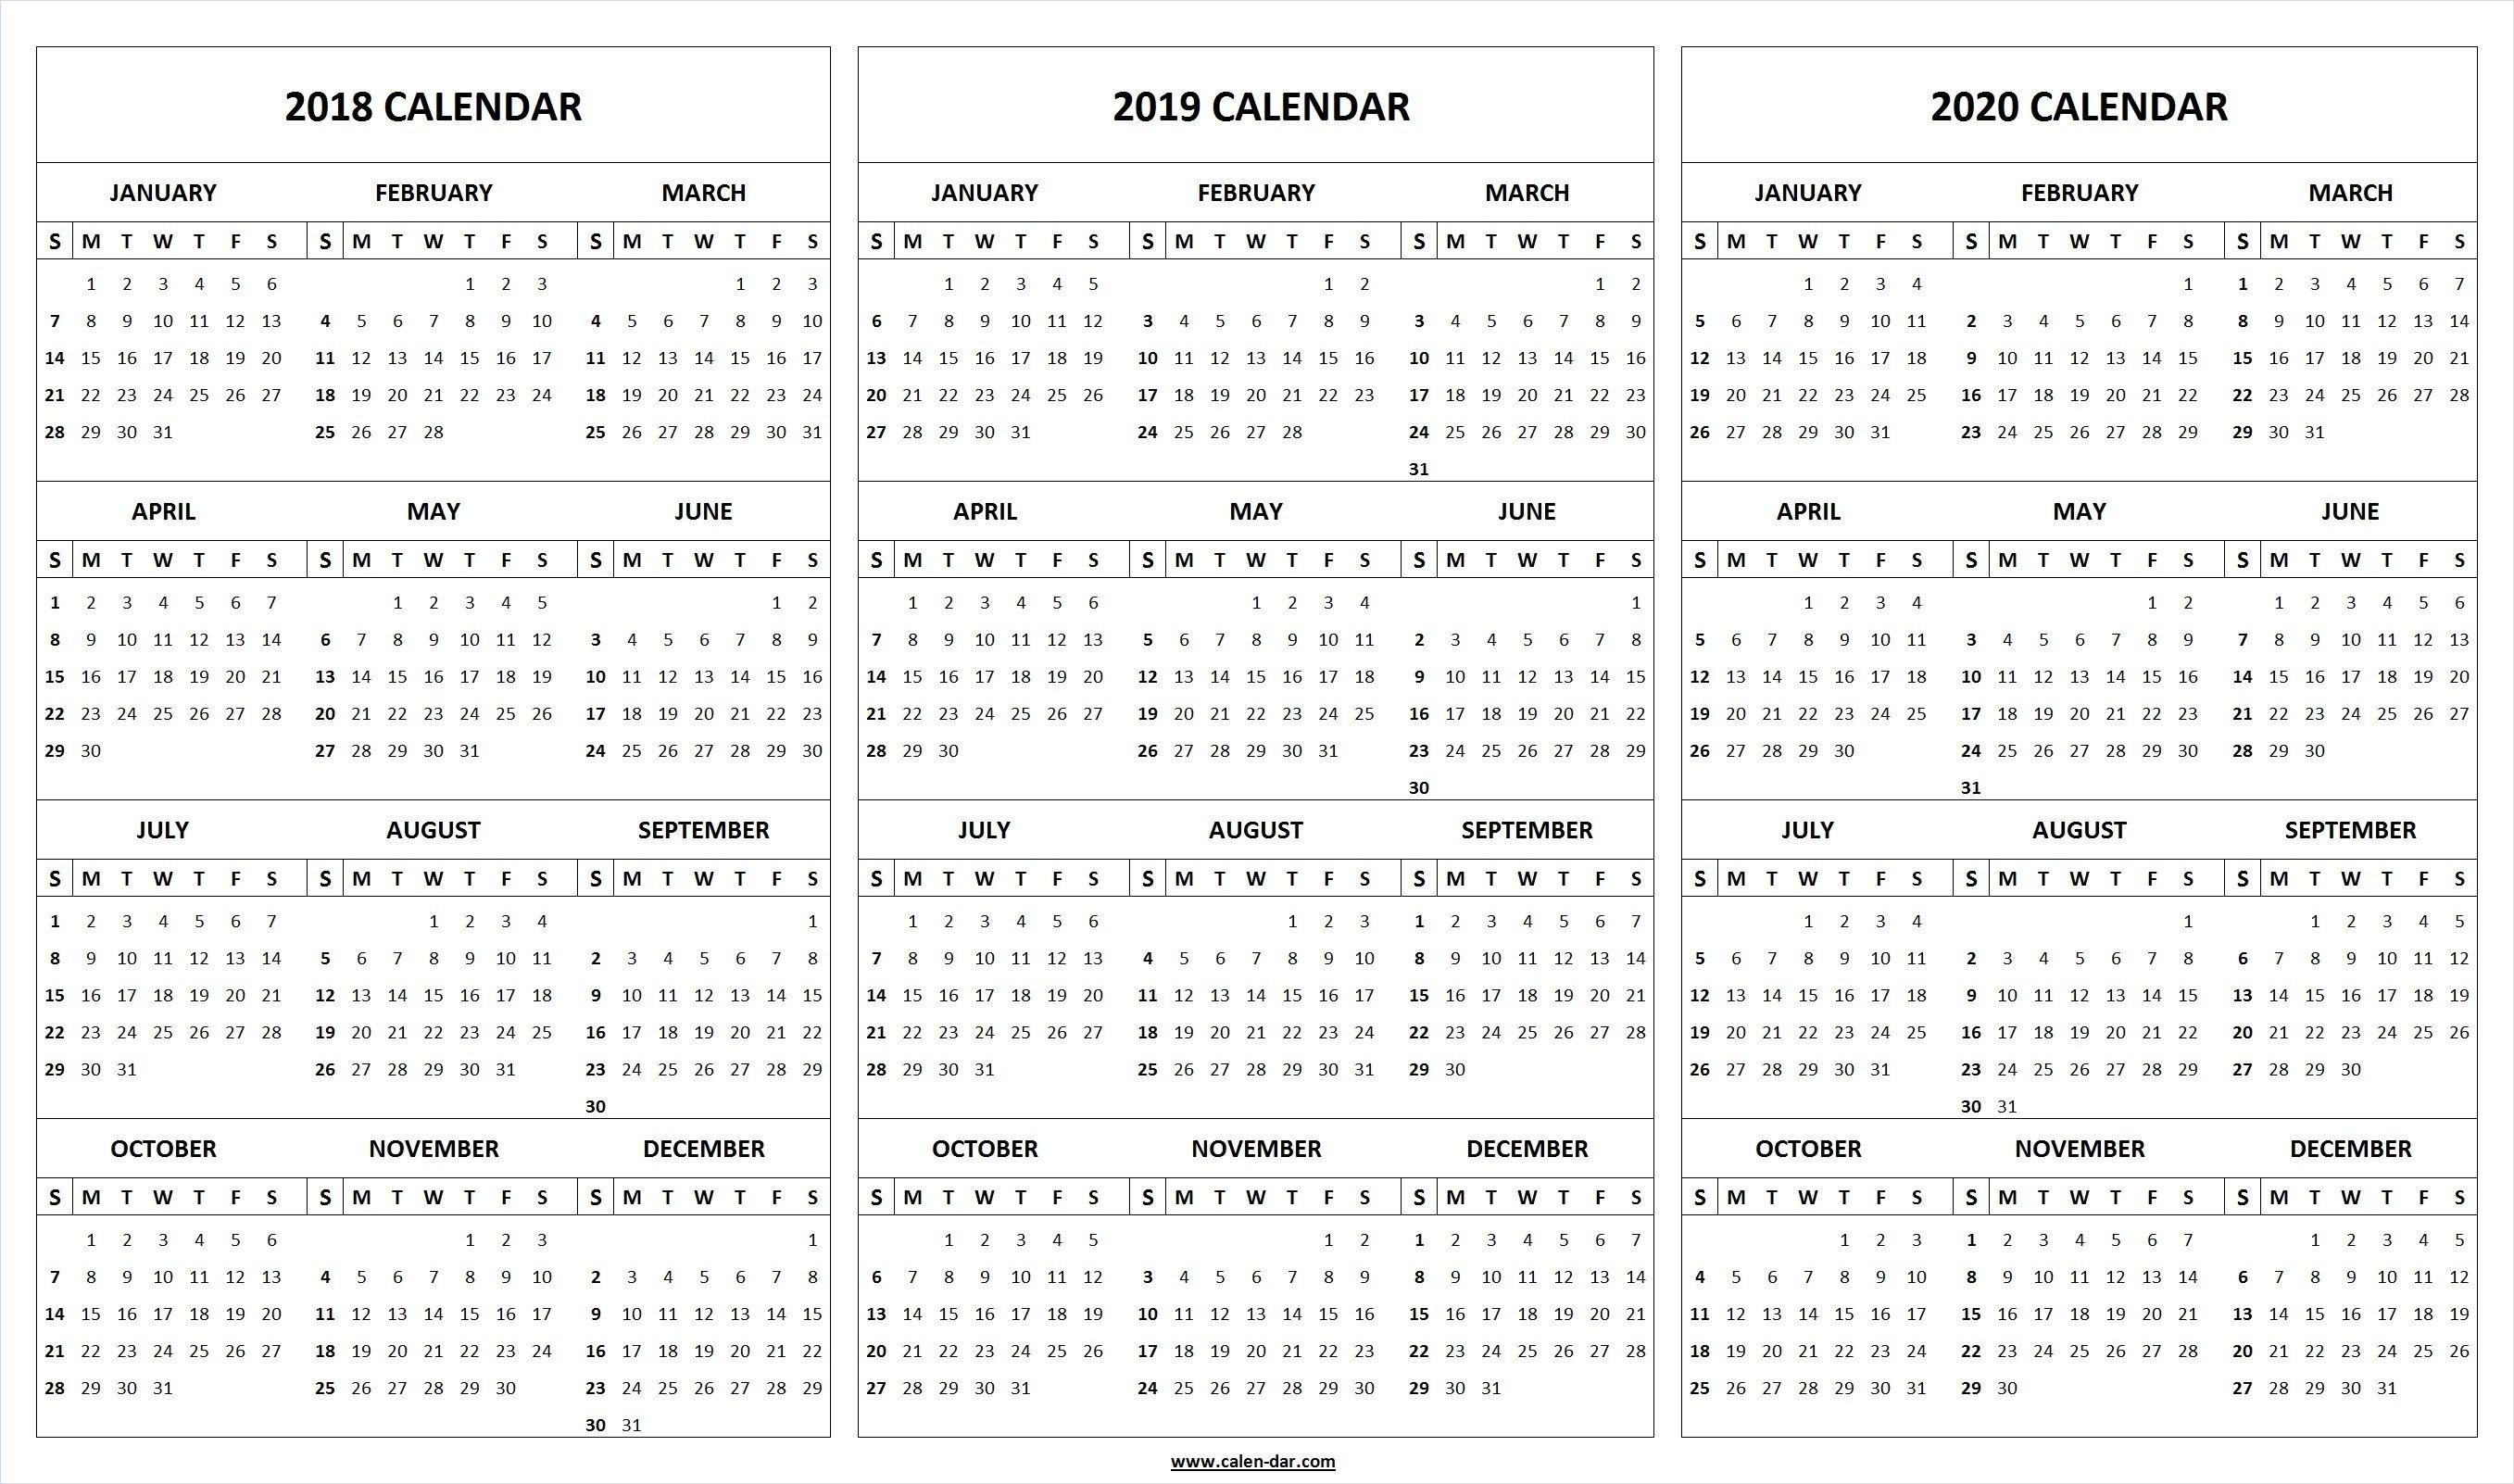 Print Blank 2018 2019 2020 Calendar Template | Organize! | Printable within Calander Single Page Printable 2019 2020